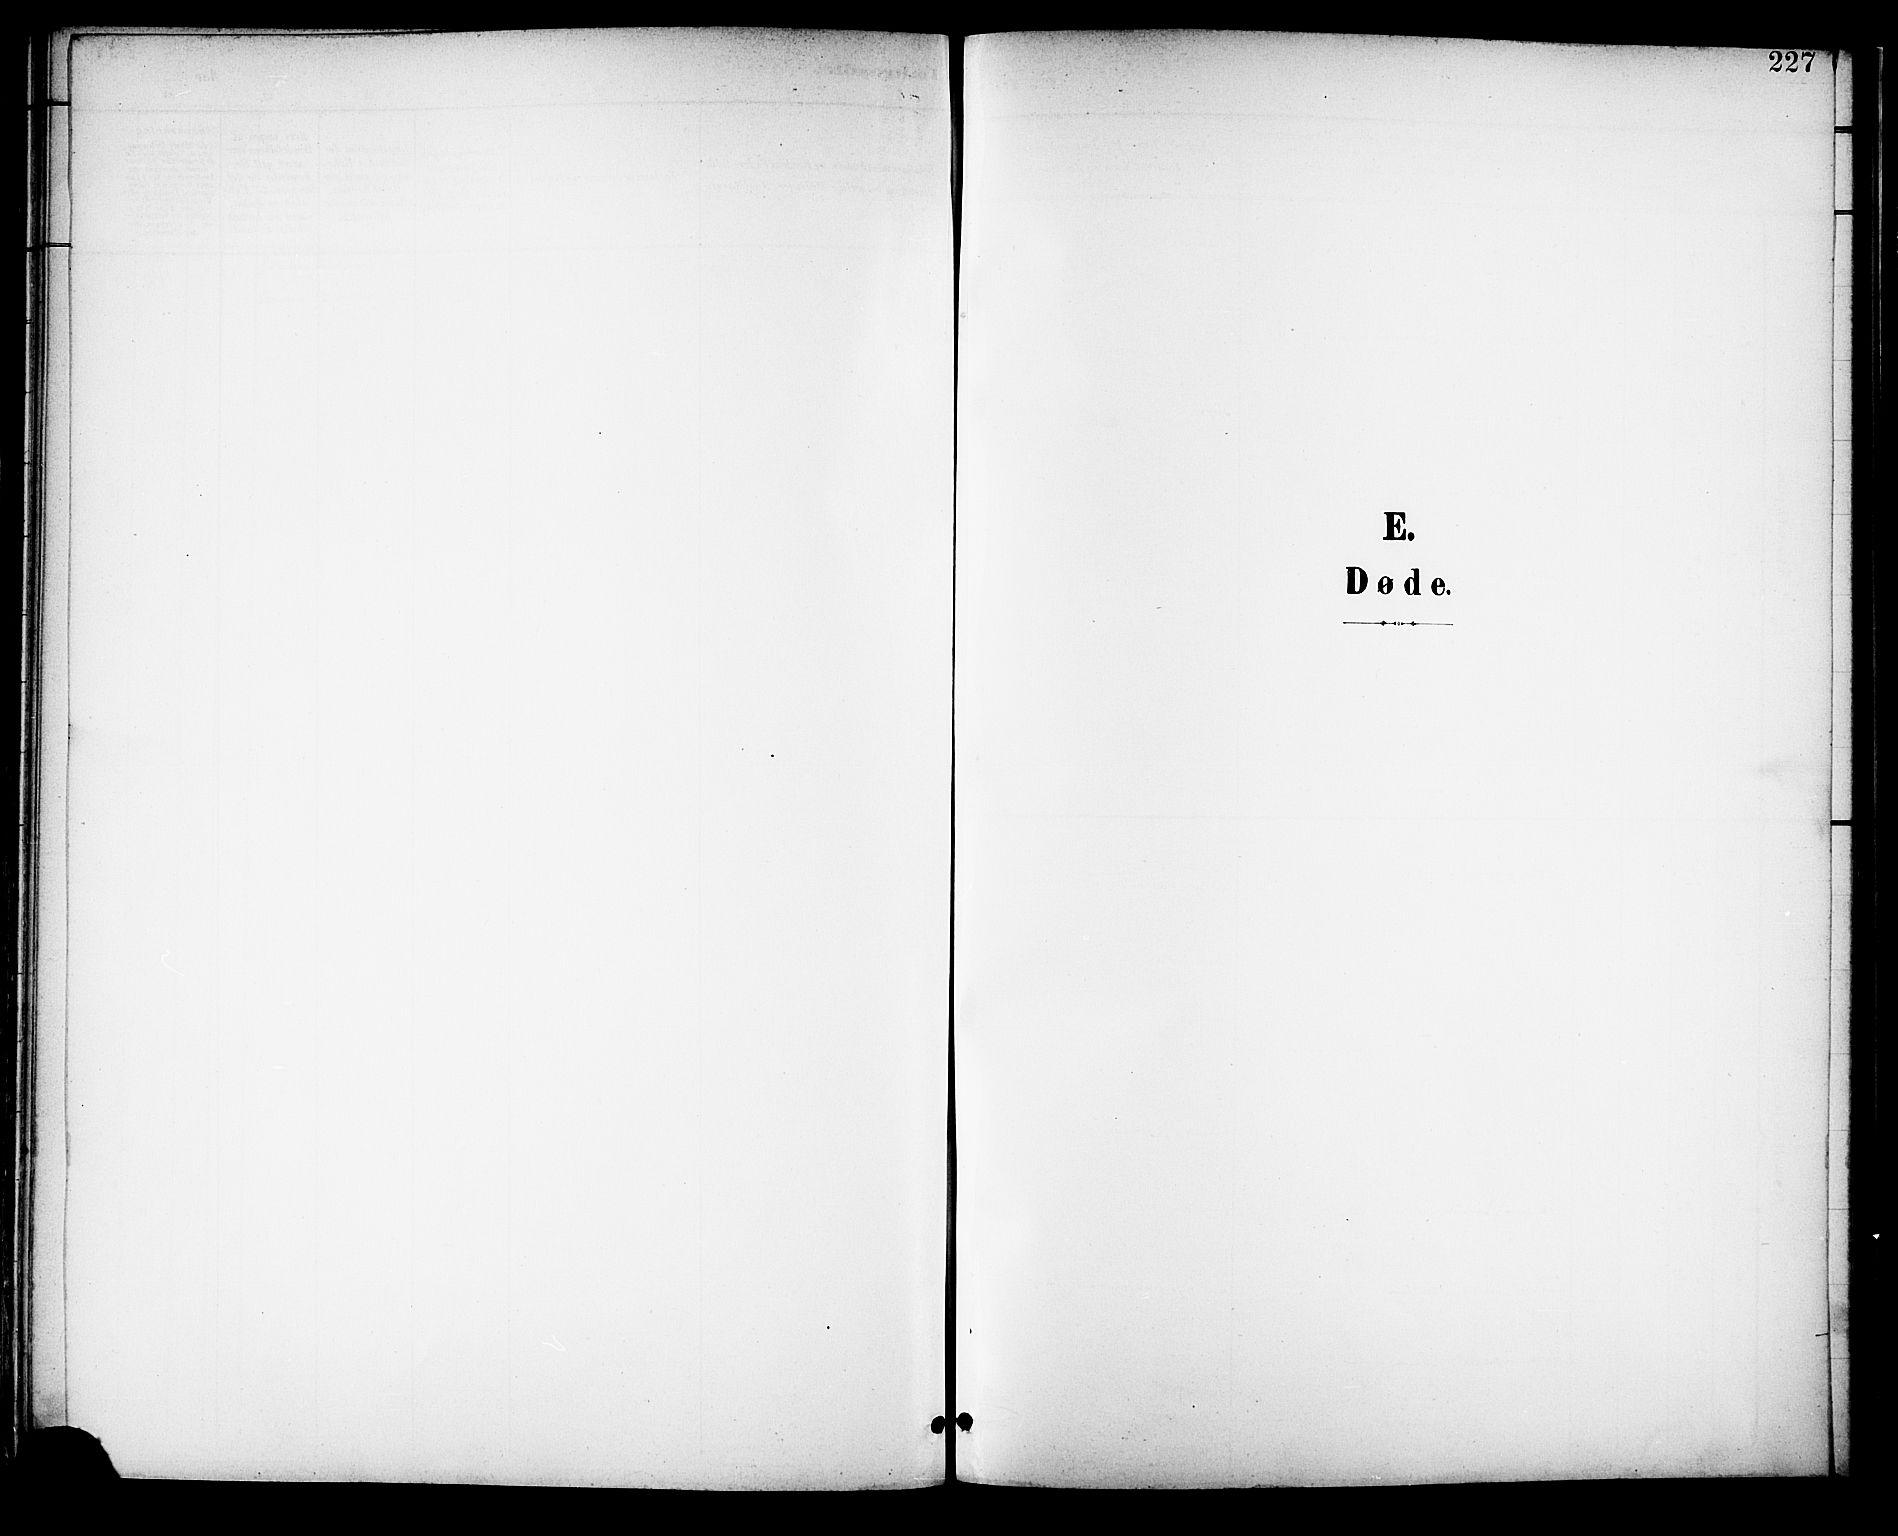 SAT, Ministerialprotokoller, klokkerbøker og fødselsregistre - Nordland, 882/L1179: Ministerialbok nr. 882A01, 1886-1898, s. 227